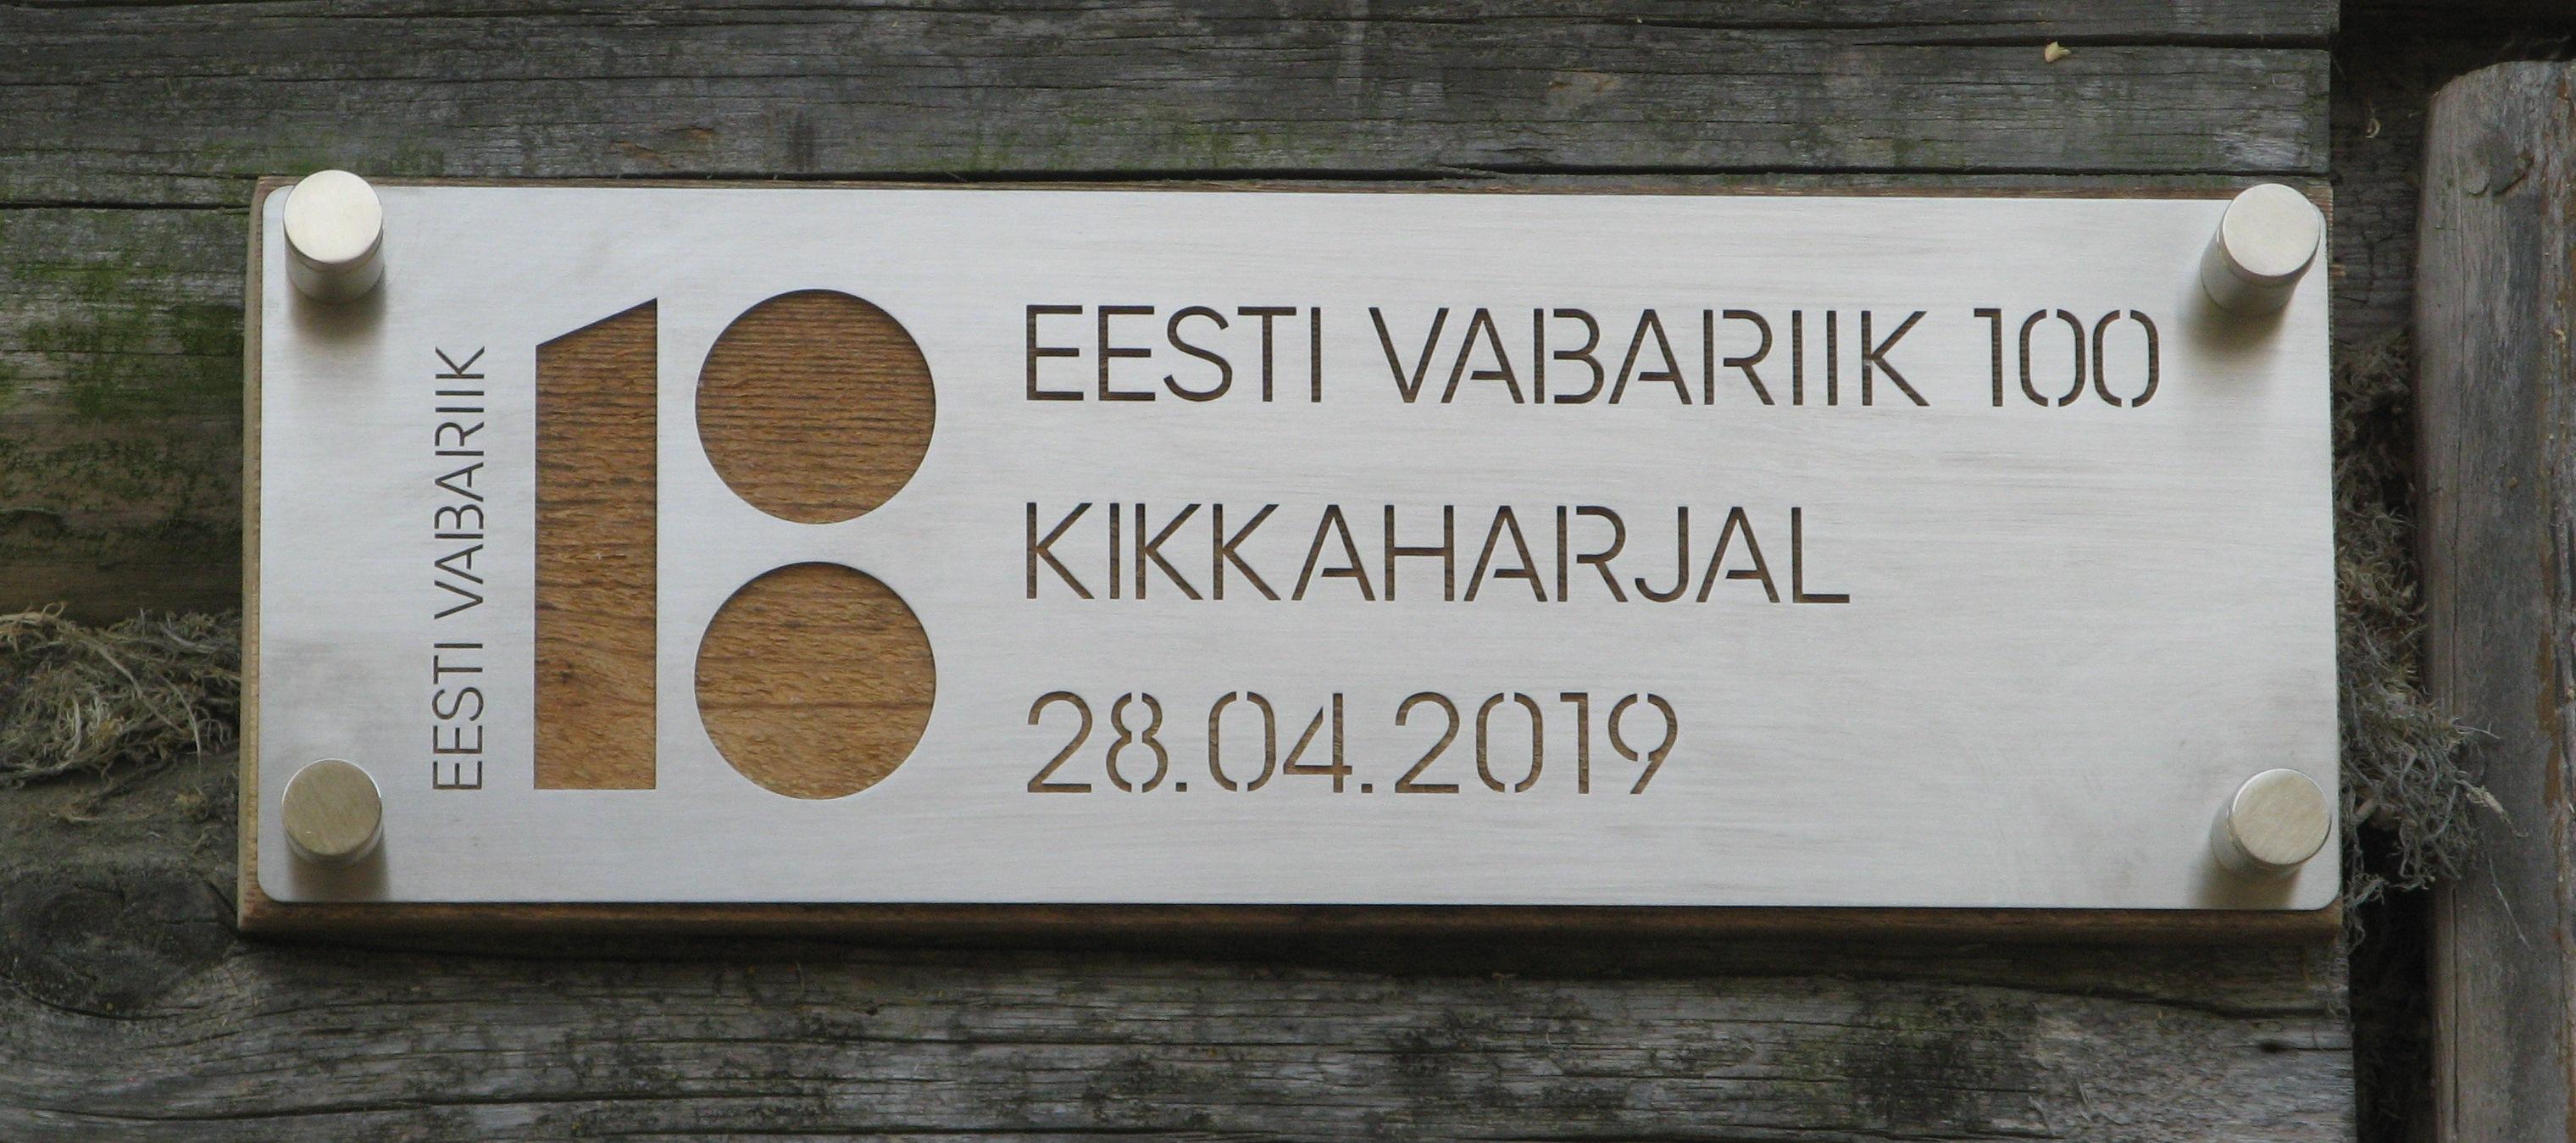 """EV100 igas külas"" ühisüritus"